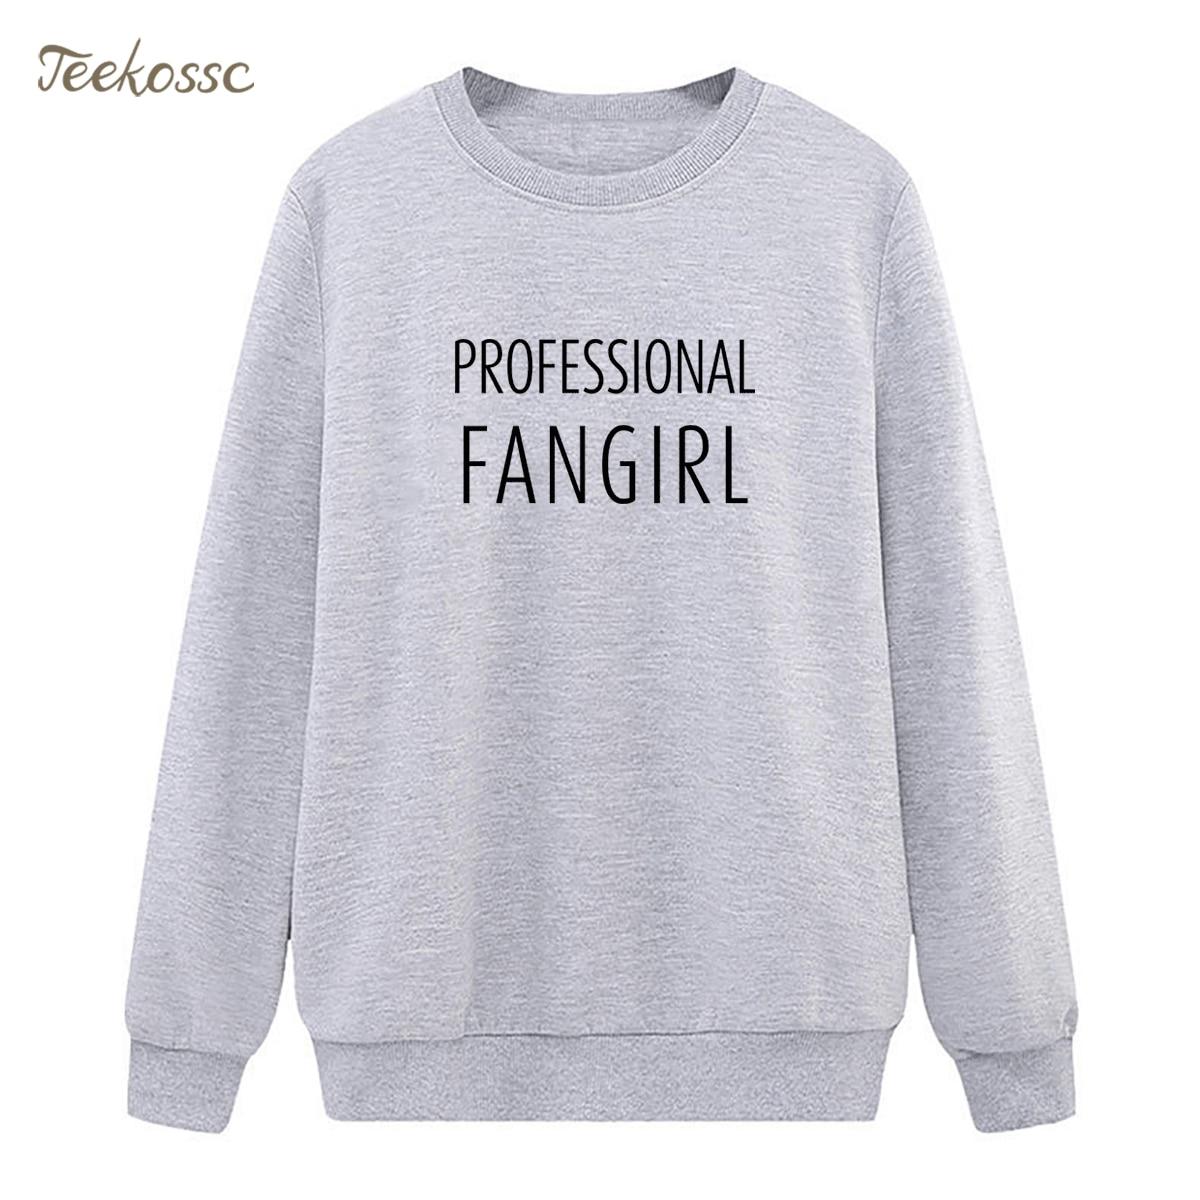 Professional Fangirl Sweatshirts Womens Casual Hoodies 2018 Winter Autumn Lady Pullover Loose Fleece Sportswear Hipstrer Hoody